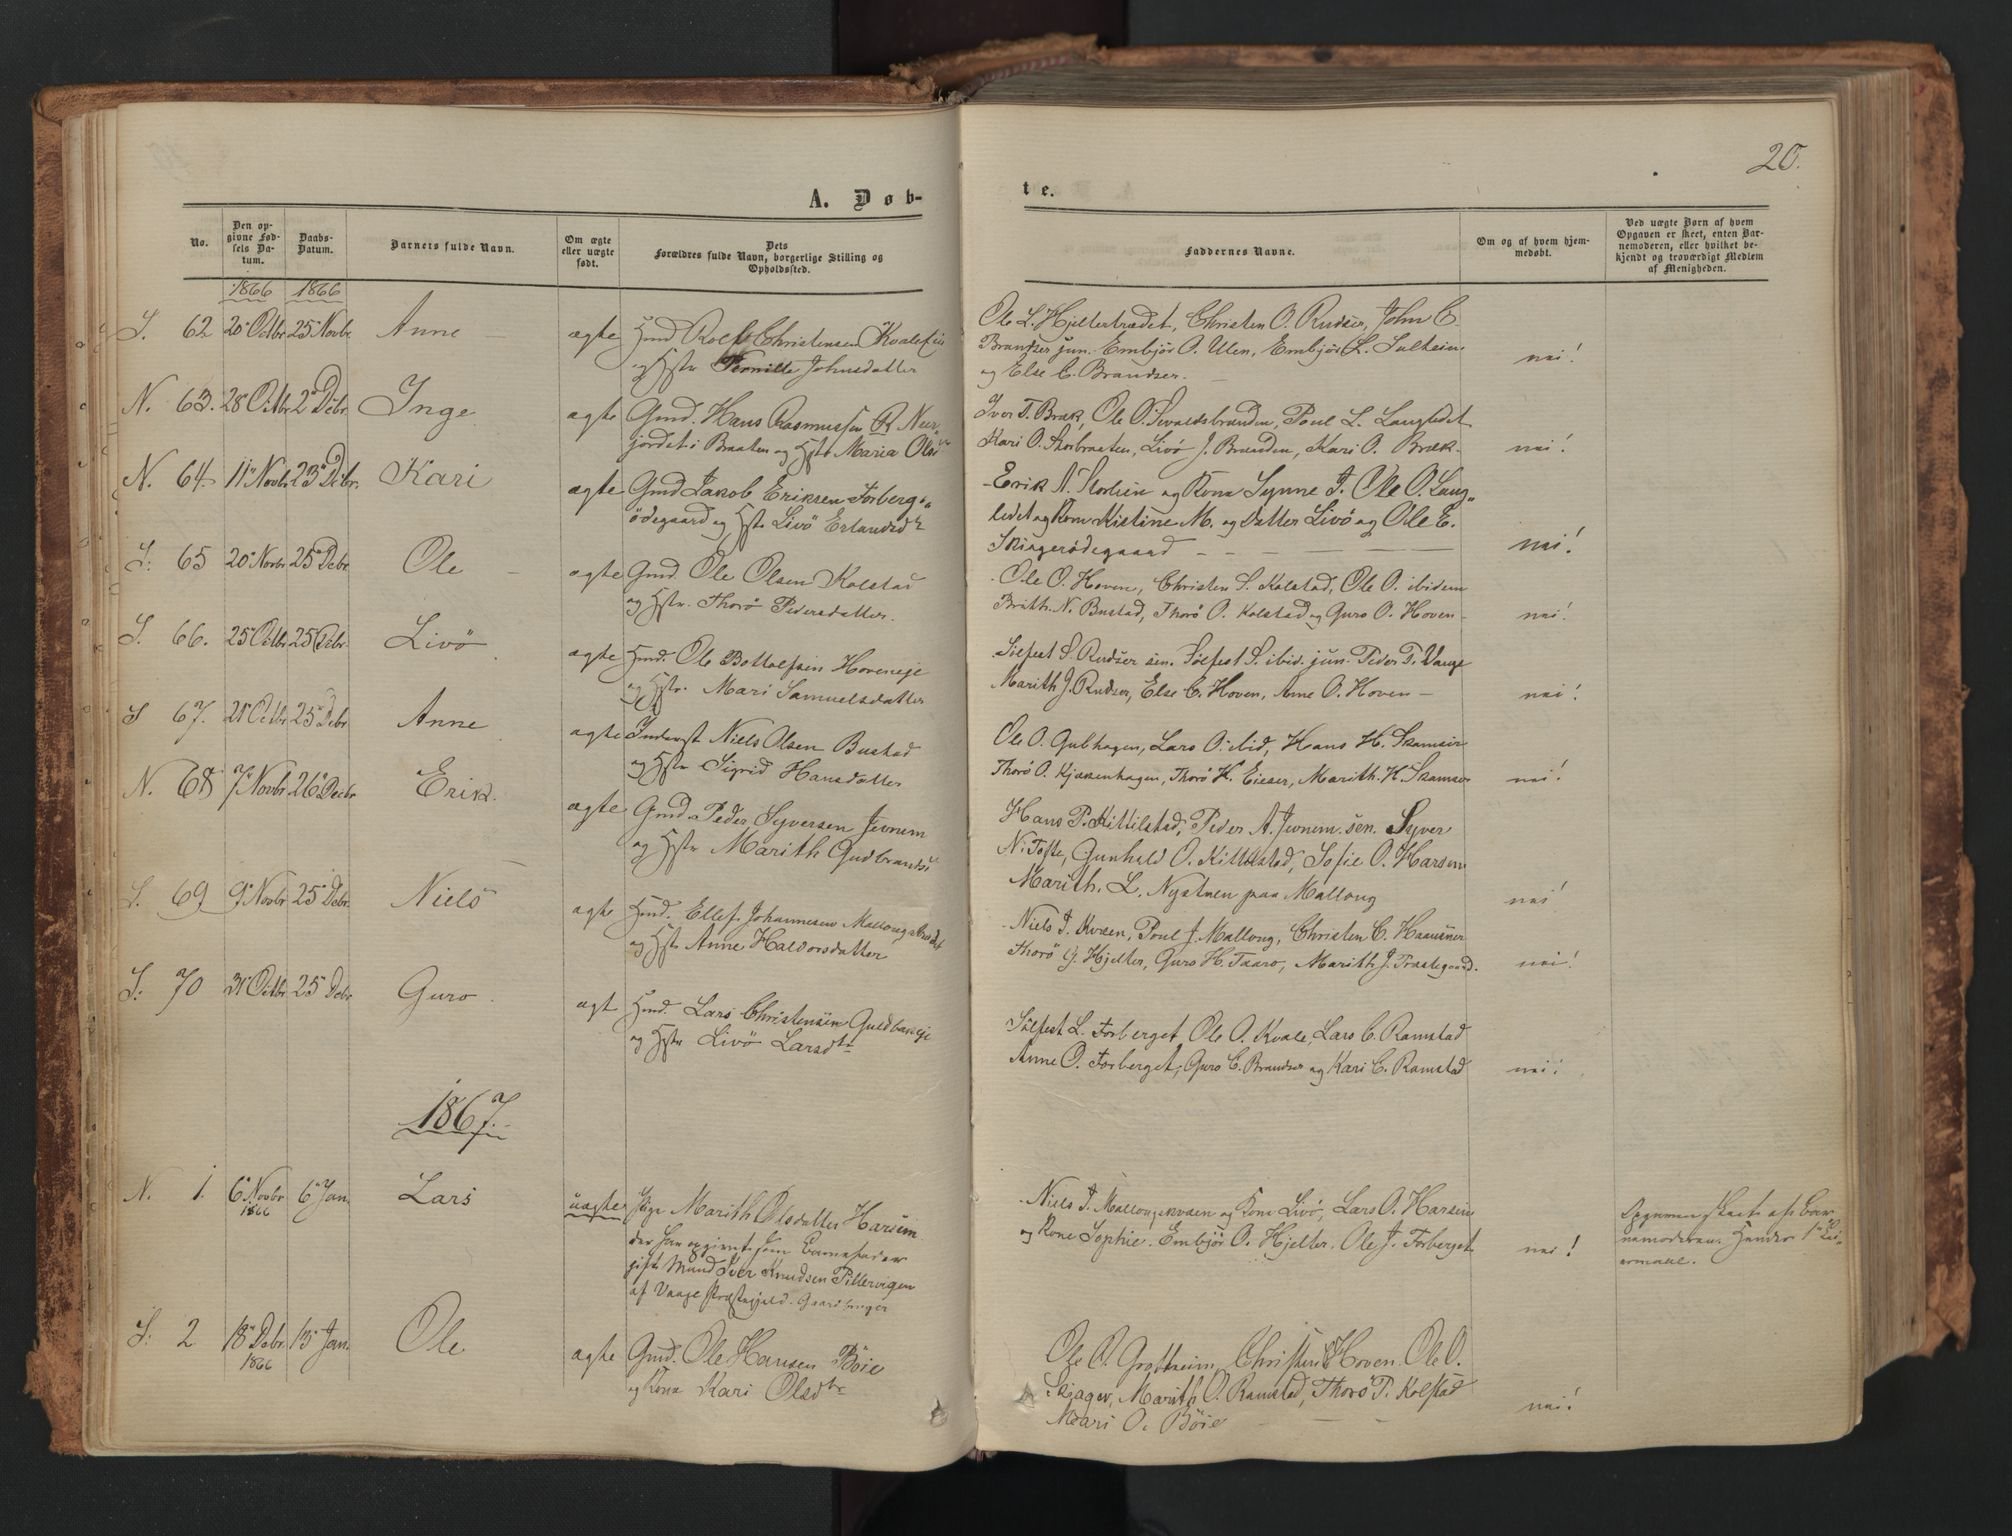 SAH, Skjåk prestekontor, Ministerialbok nr. 1, 1863-1879, s. 20